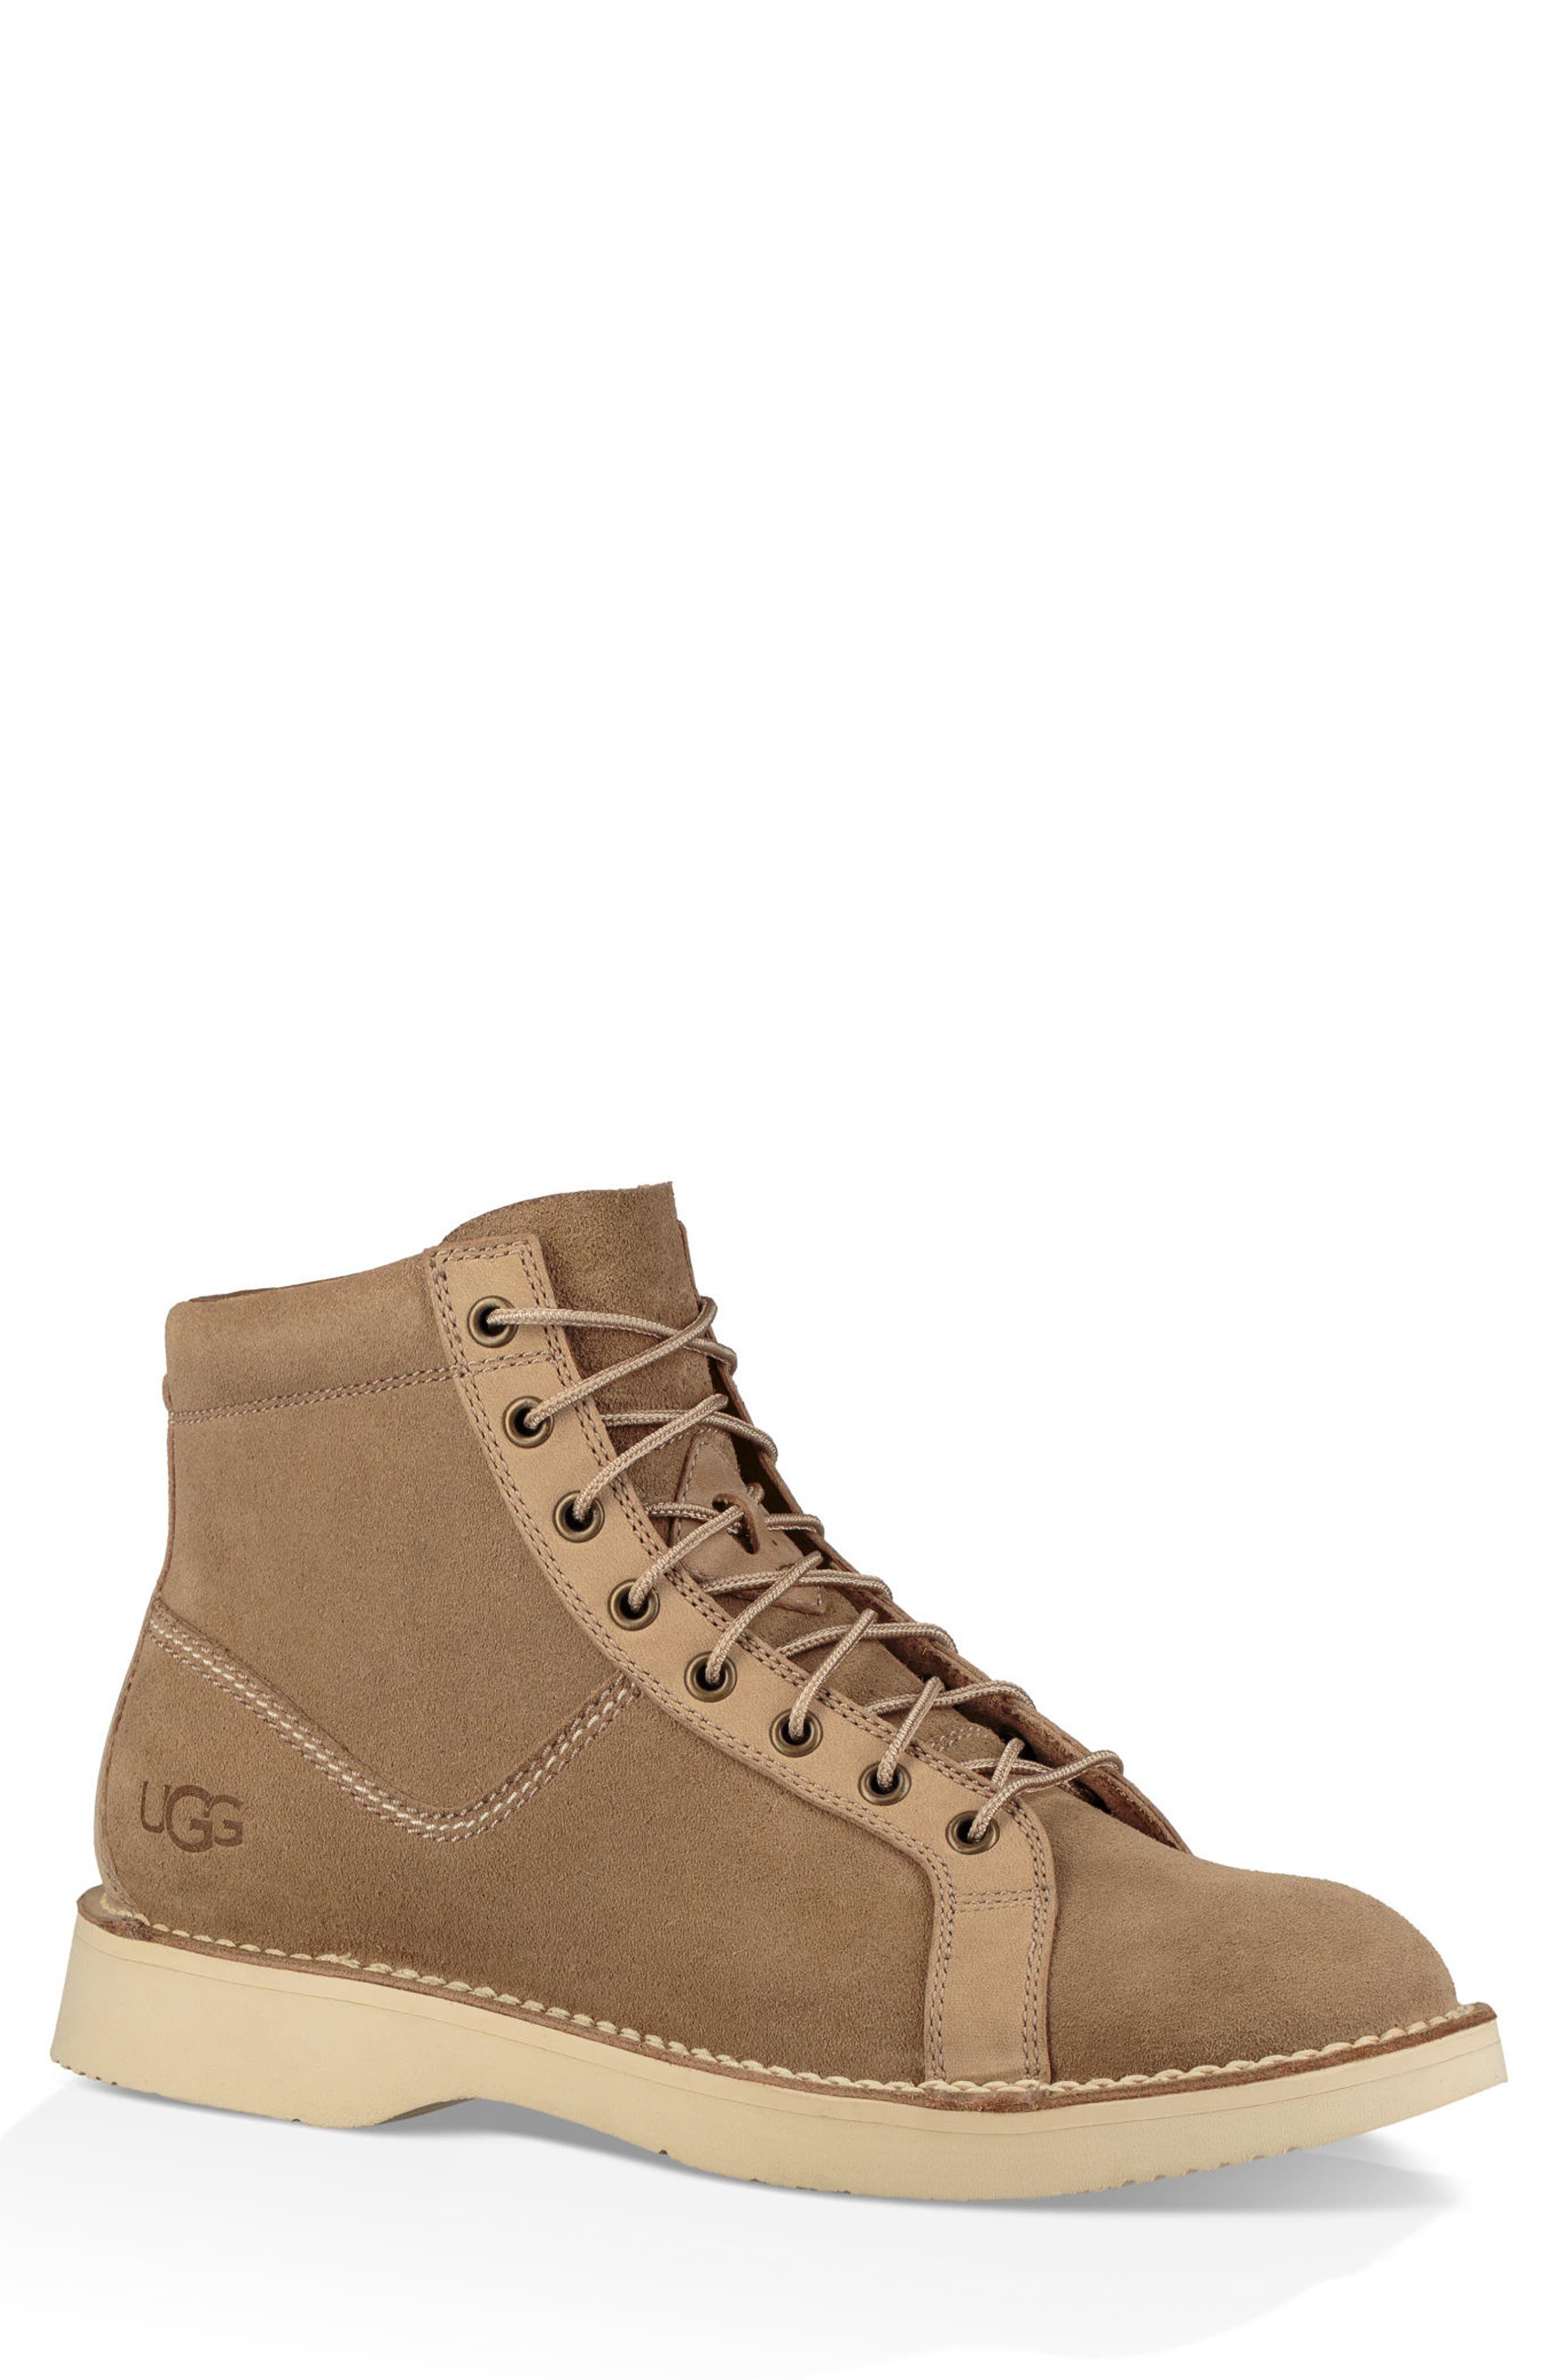 Ugg Camino Plain Toe Boot- Brown